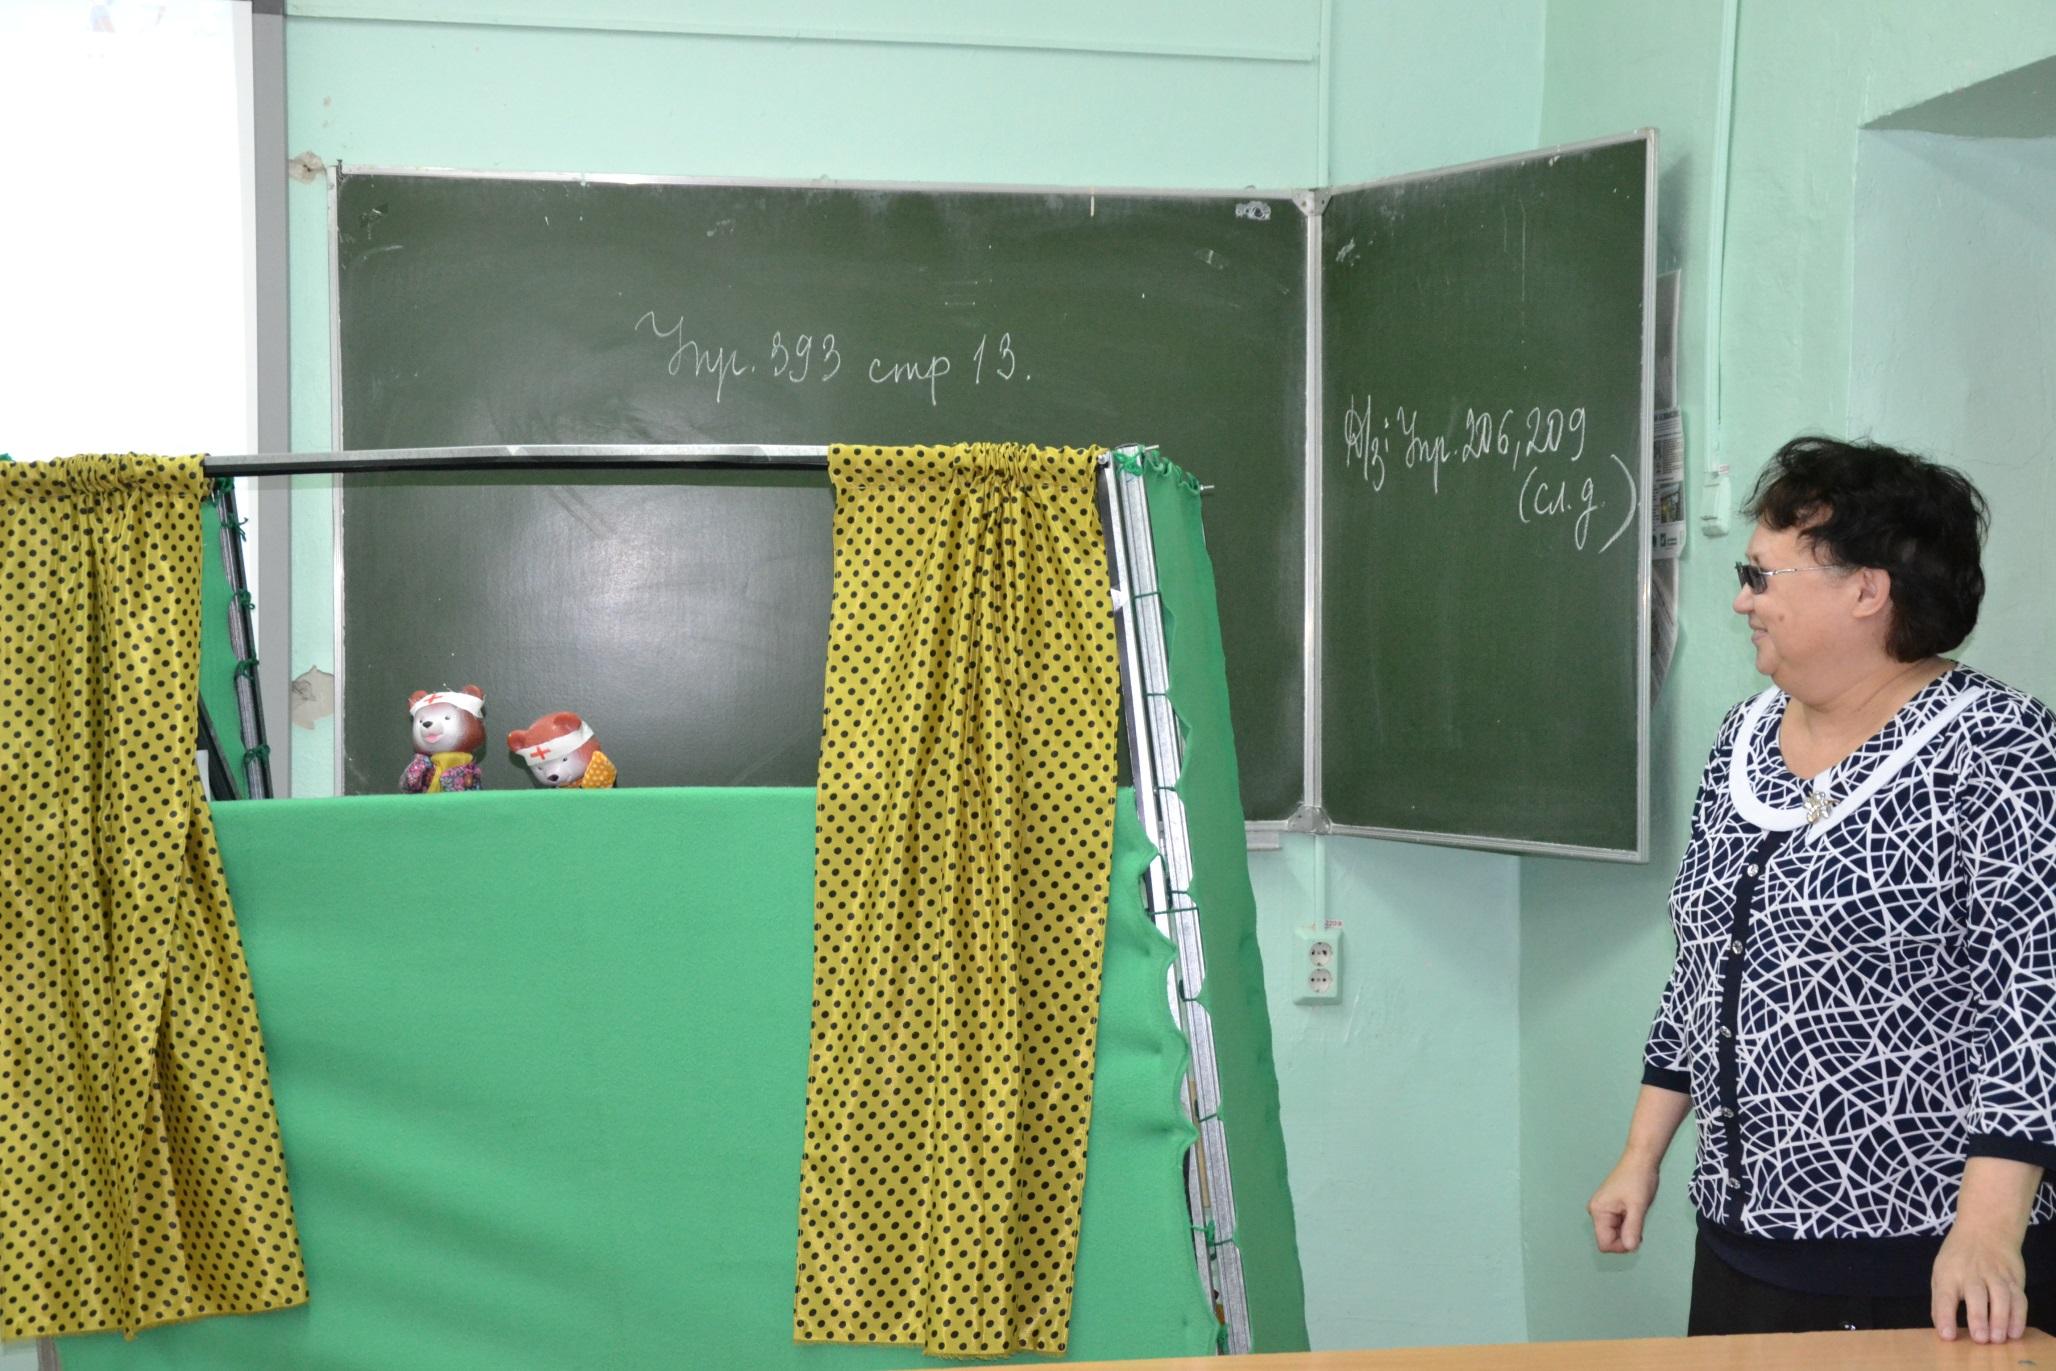 G:\фото\взаимодействие с\7 В класс 20.11.15\DSC_0079.JPG